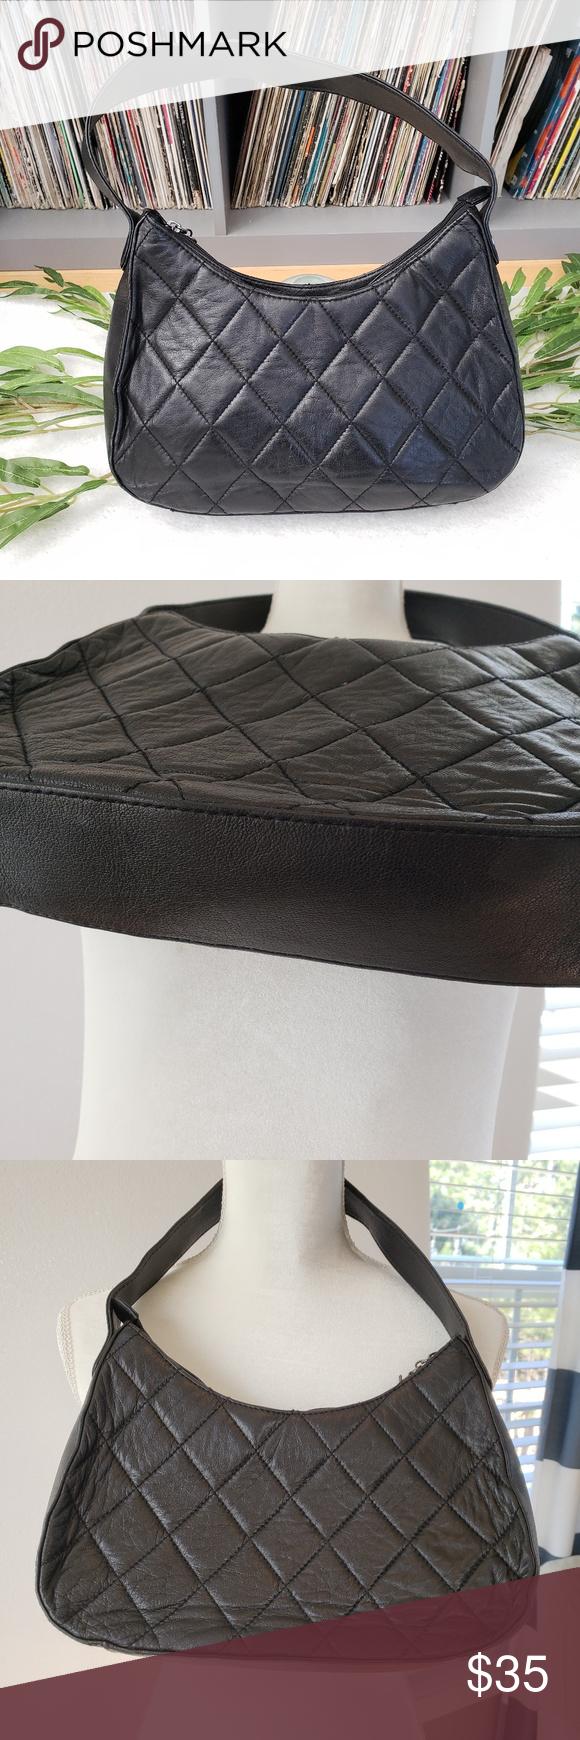 Wilsons Leather bag black quilted shoulder Venus Williams